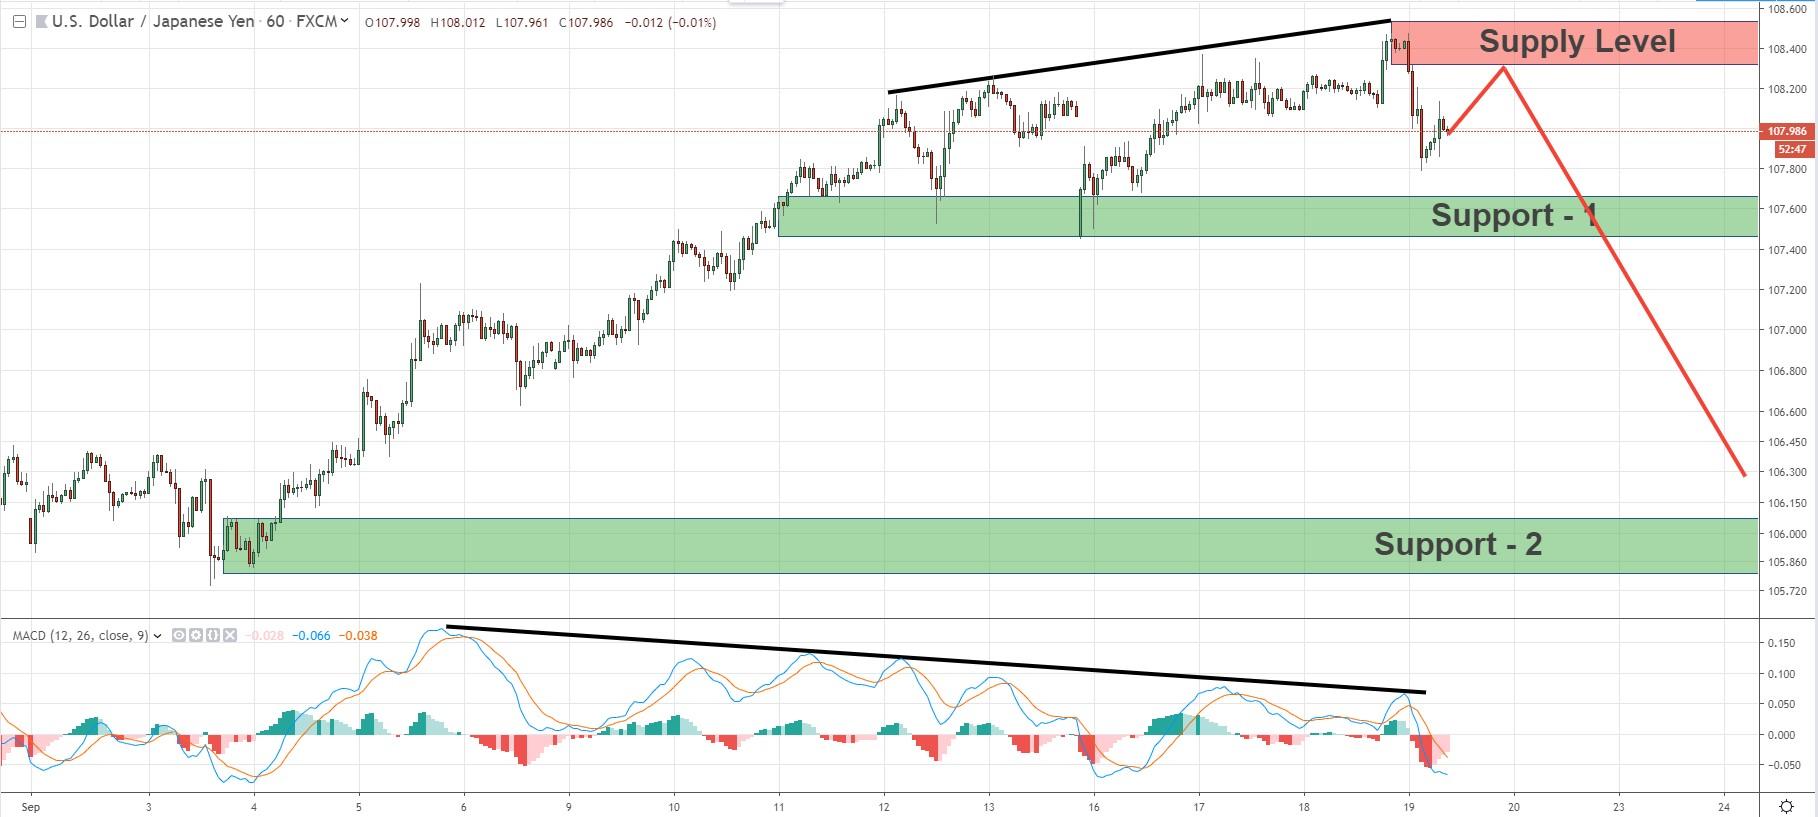 Quasimodo Forex Pattern - USD/JPY is still considered in bullish momentum